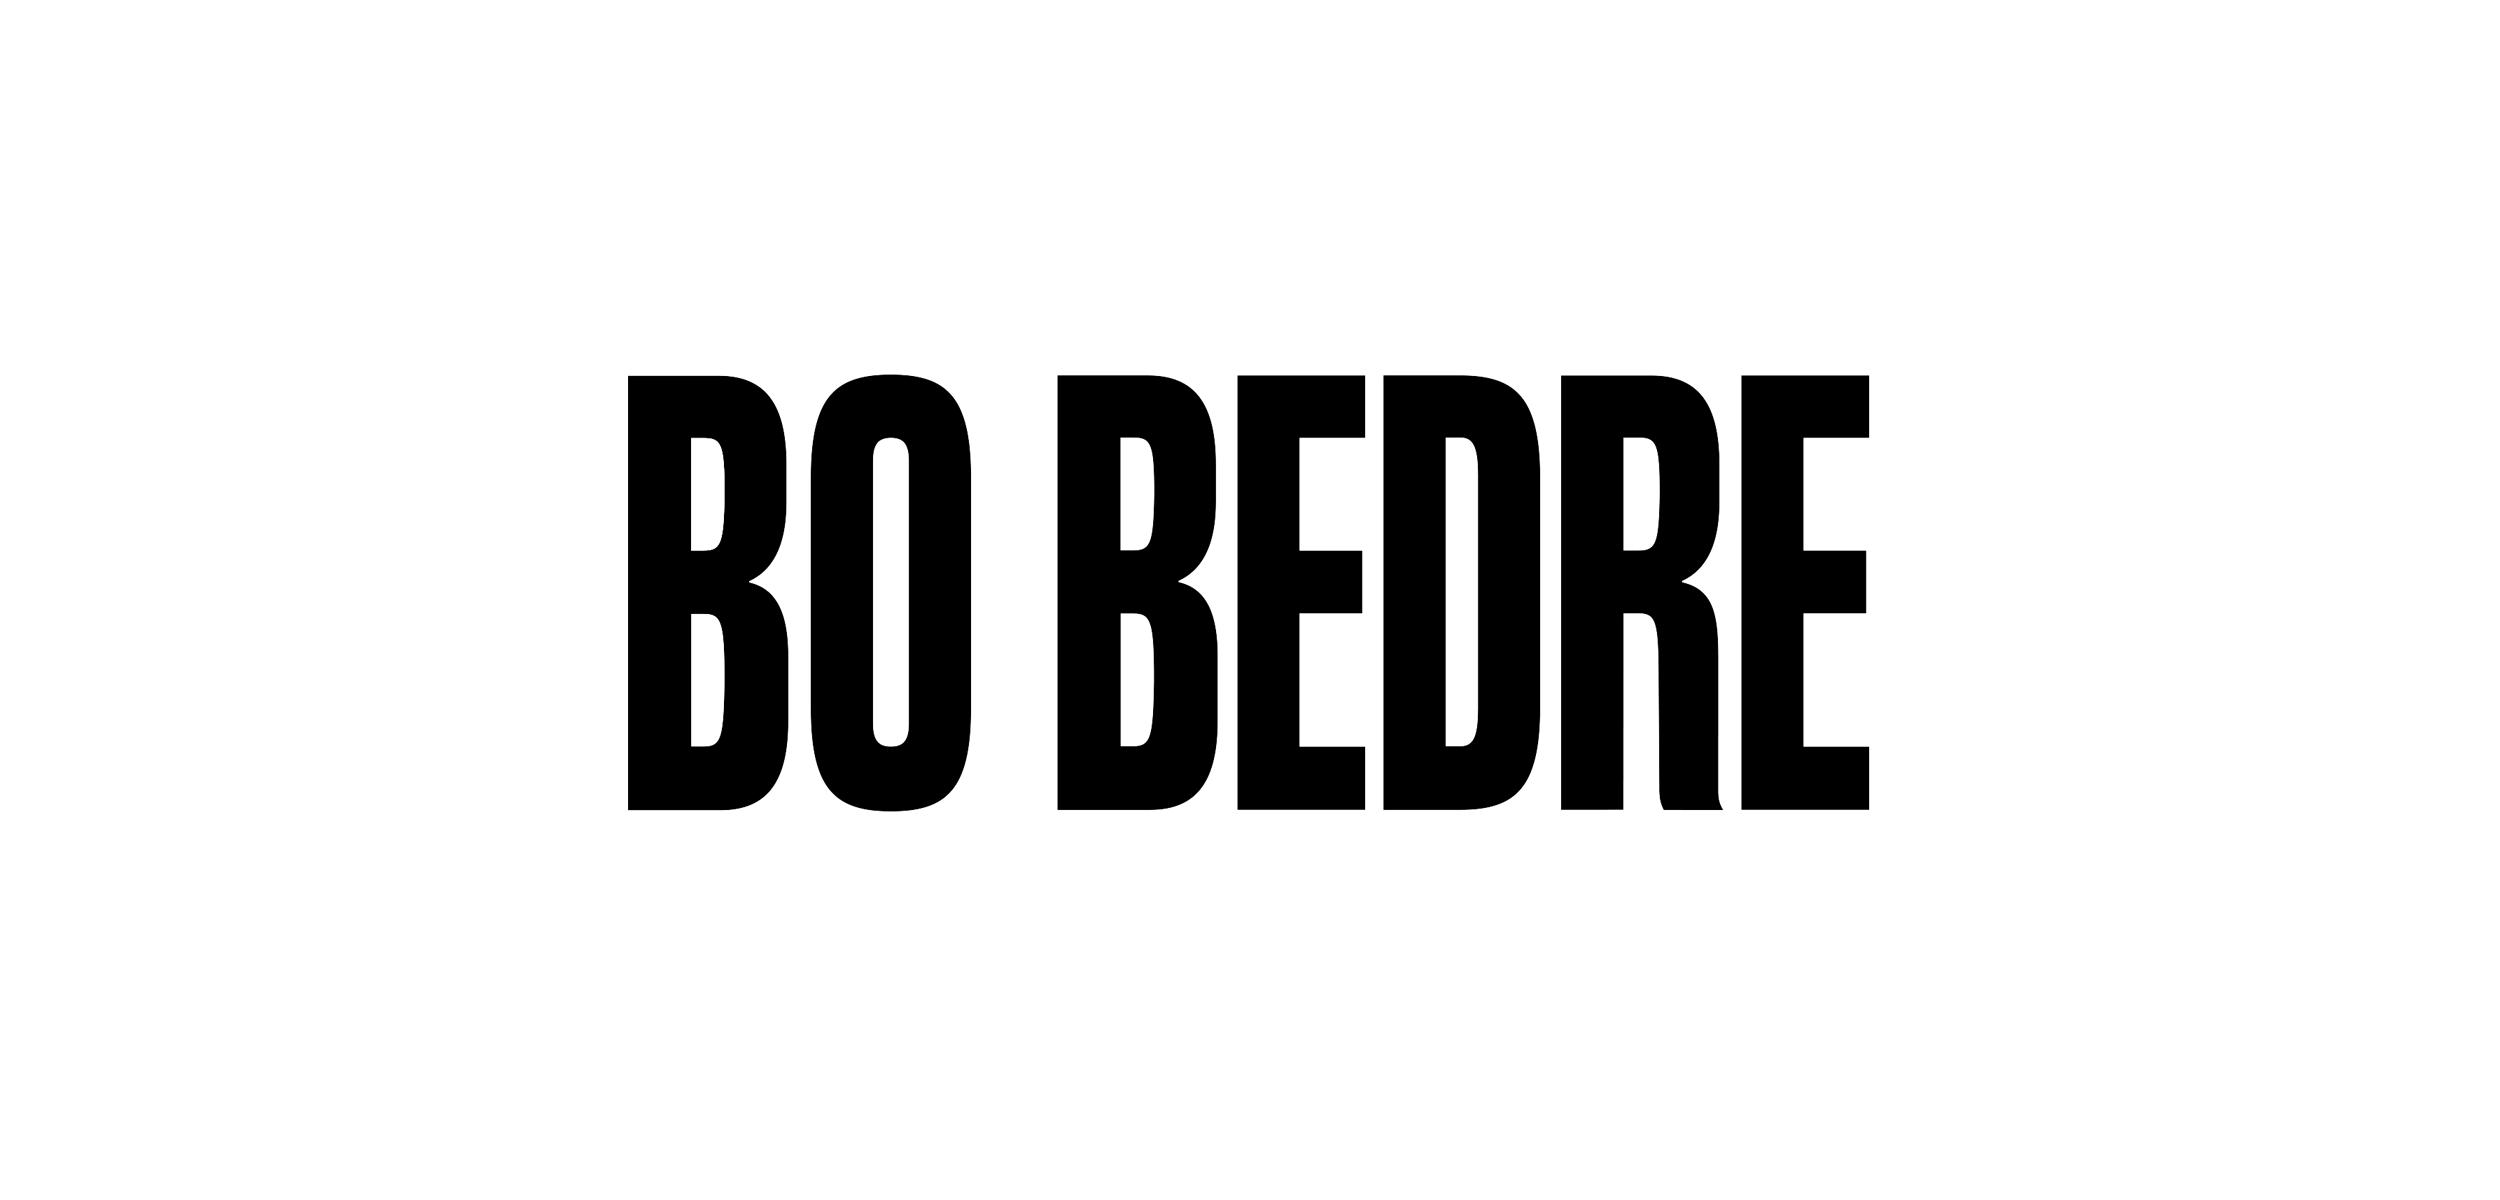 bob-logo-sort-rgb.png